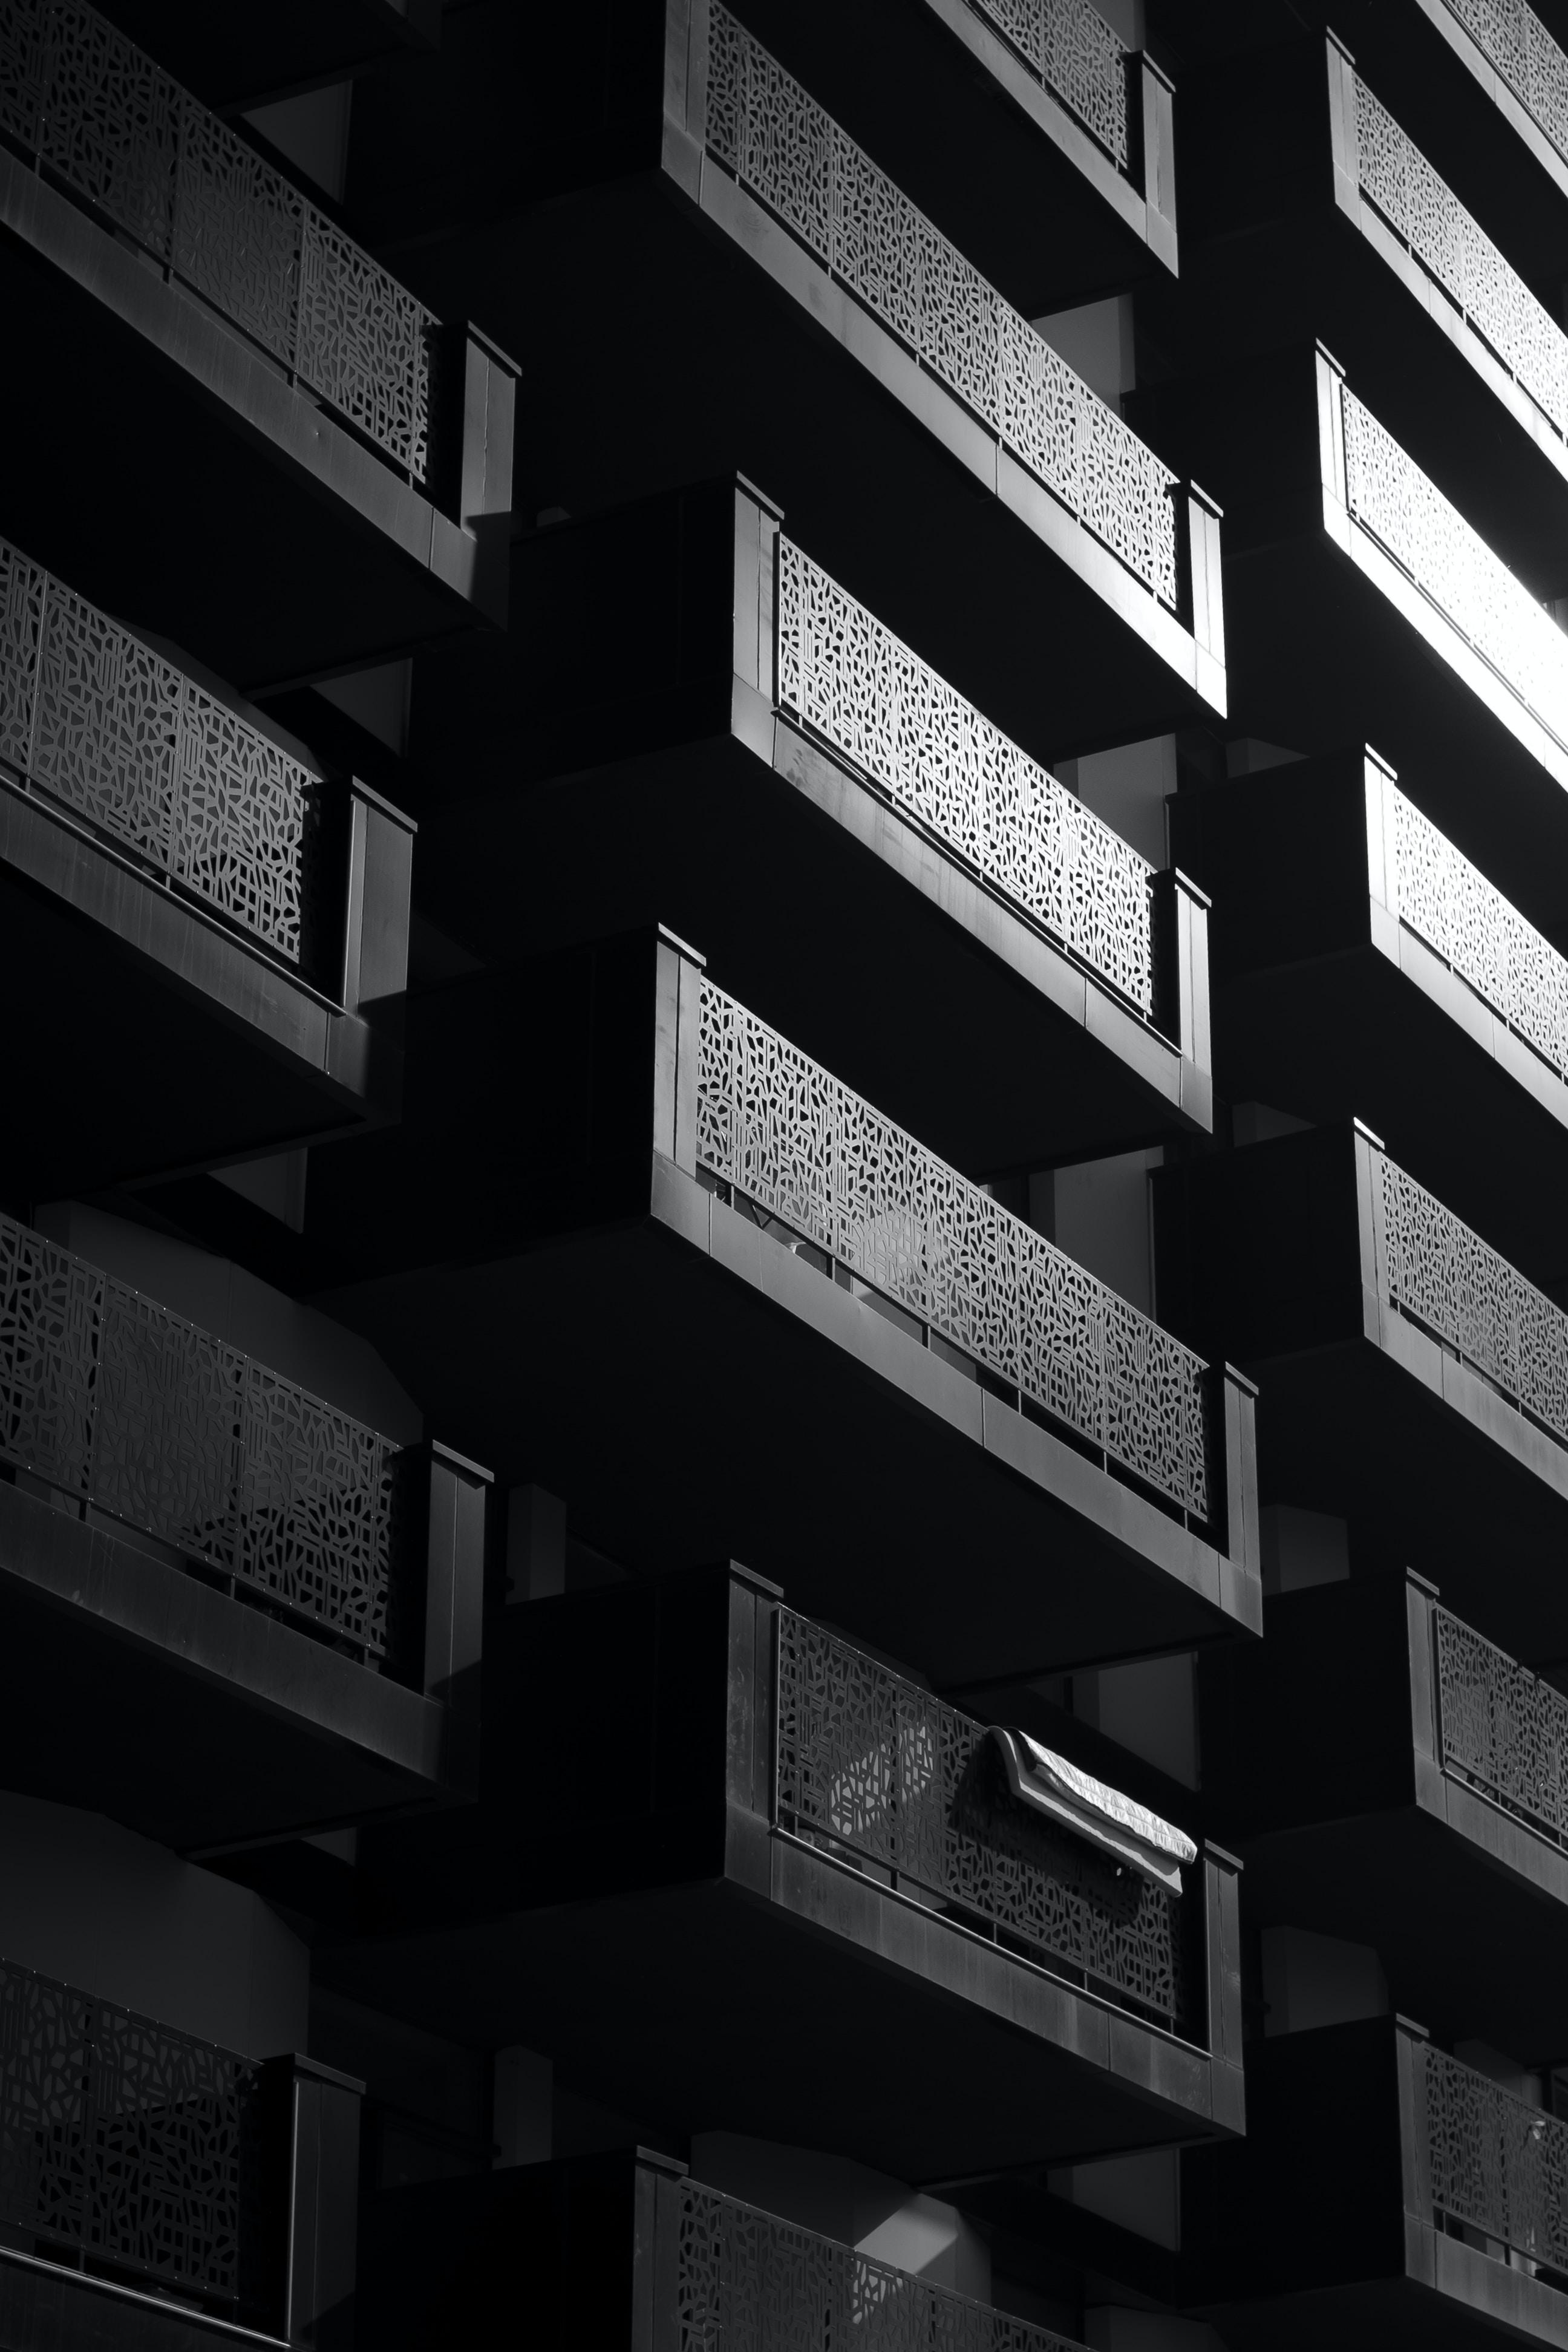 black-and-white-concrete-building